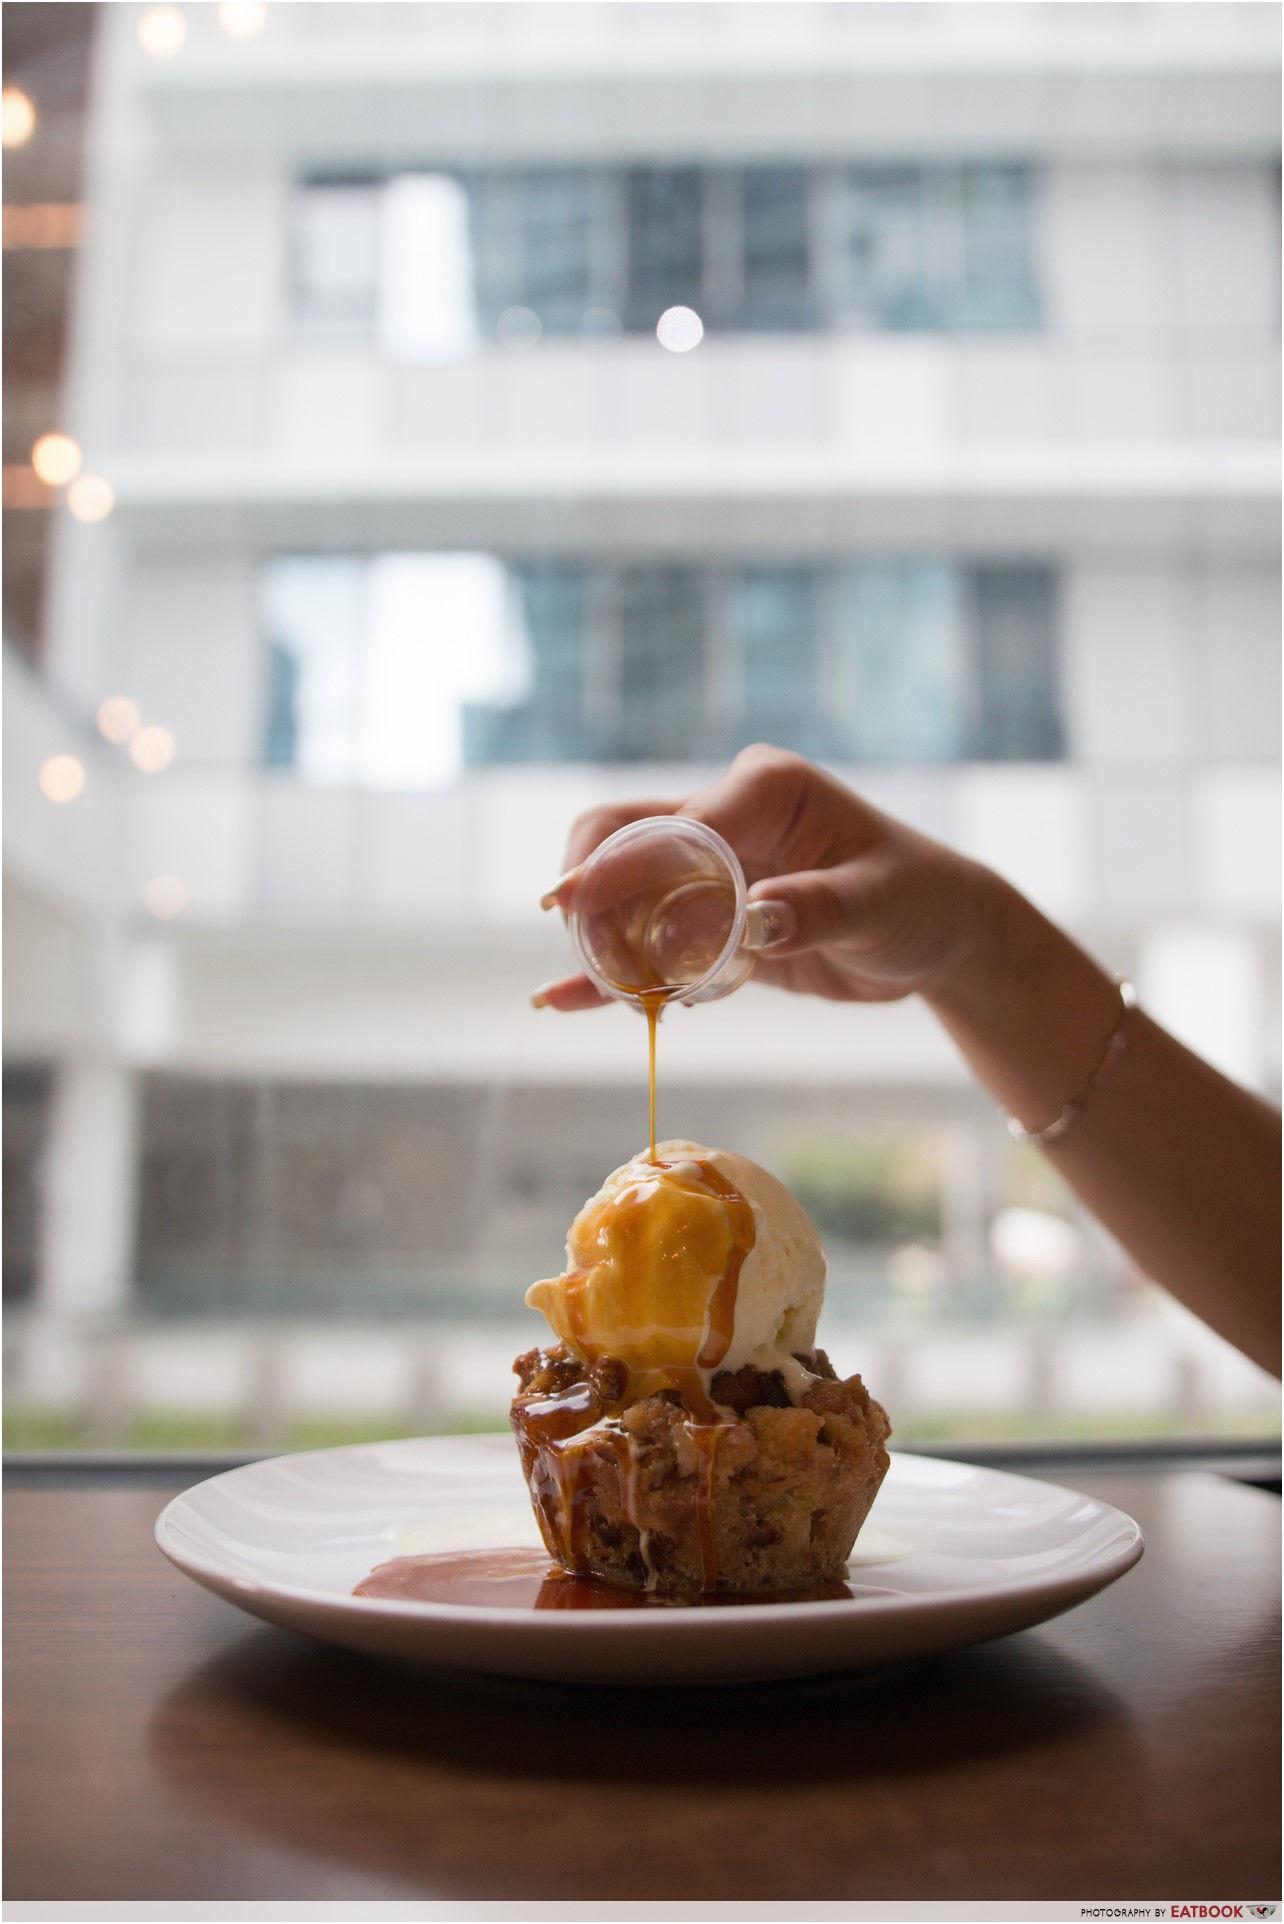 Gula Melaka Desserts - 10